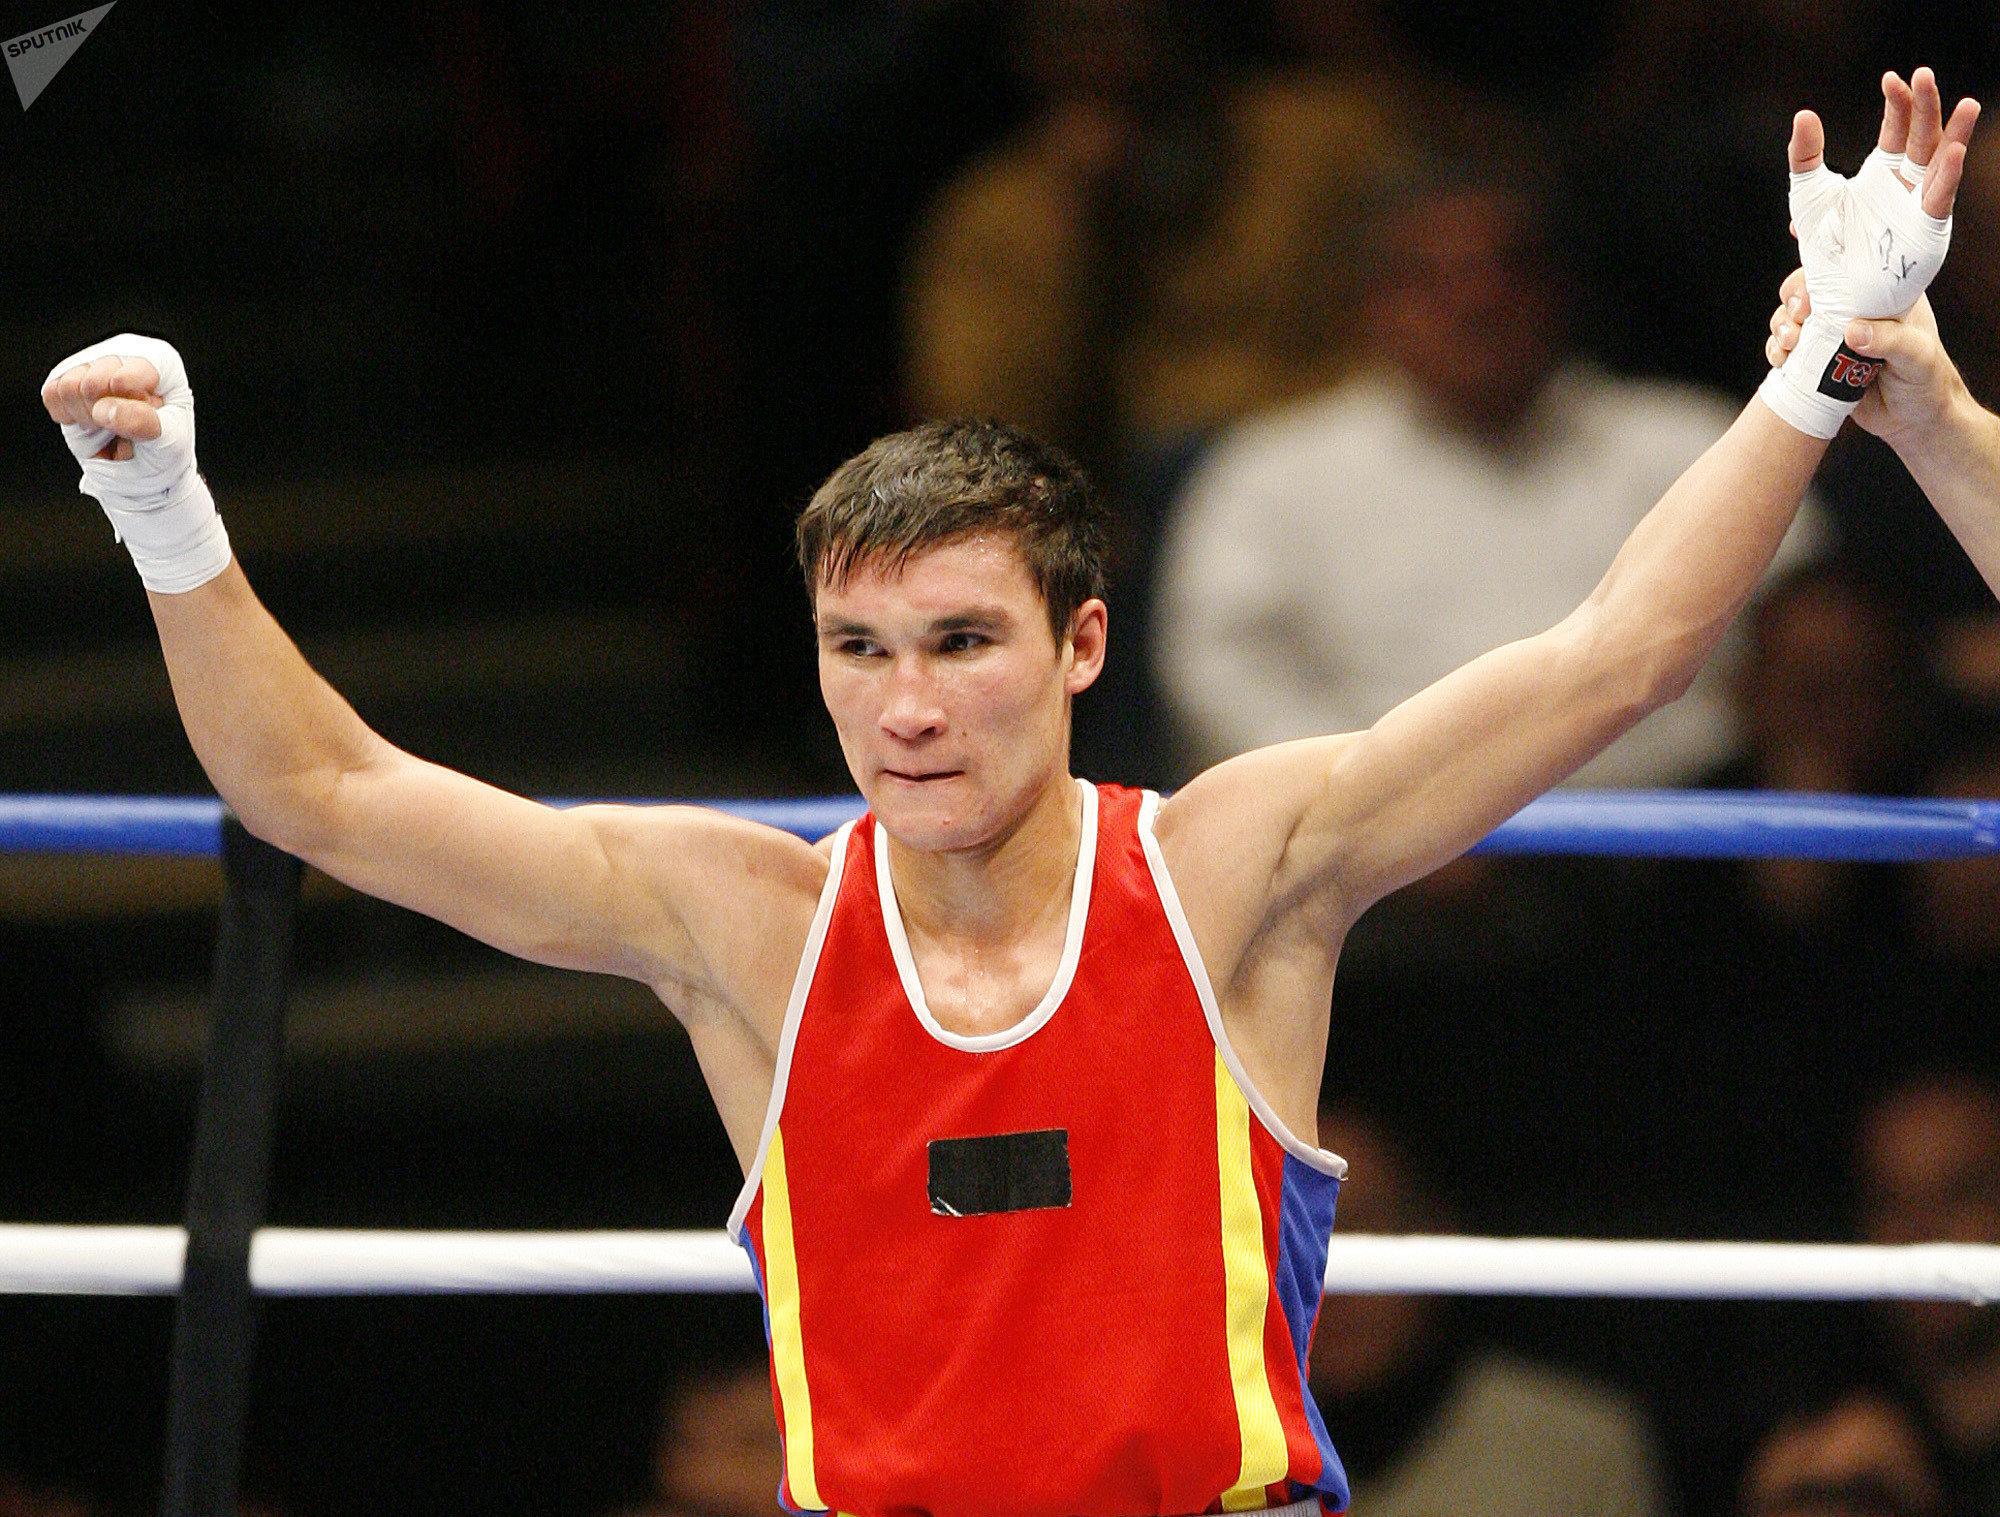 Архивное фото Серика Сапиева на чемпионате мира по боксу в Чикаго